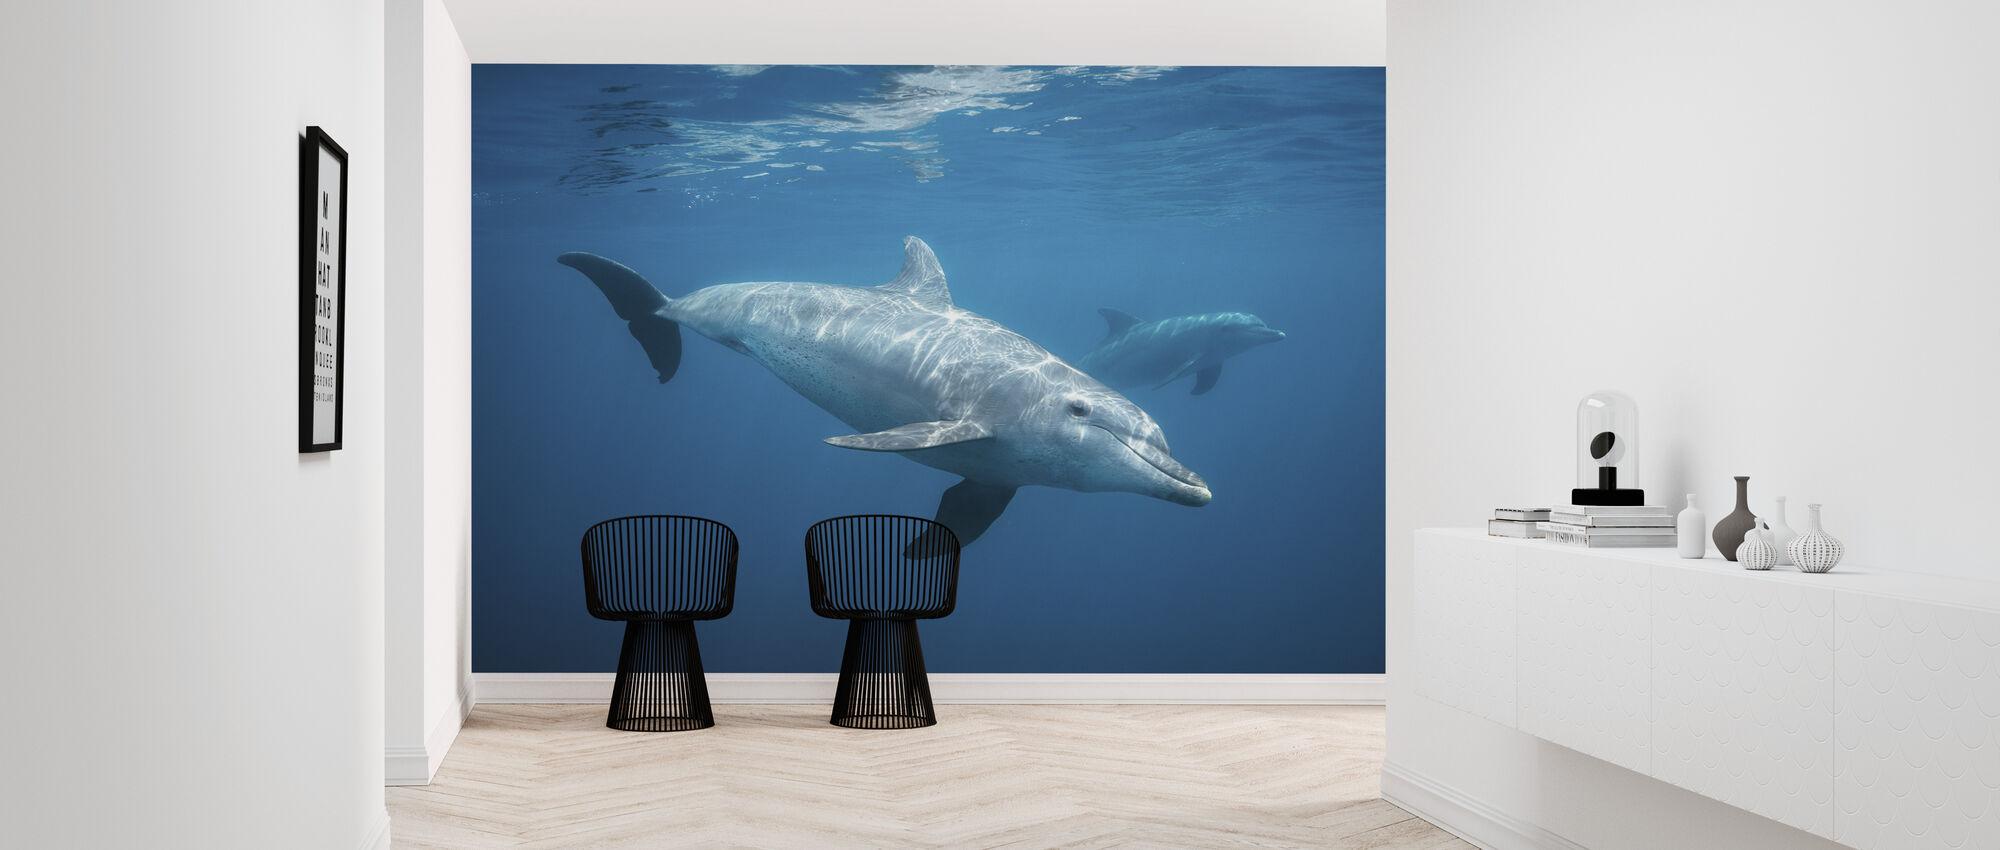 Curious Dolphin - Wallpaper - Hallway